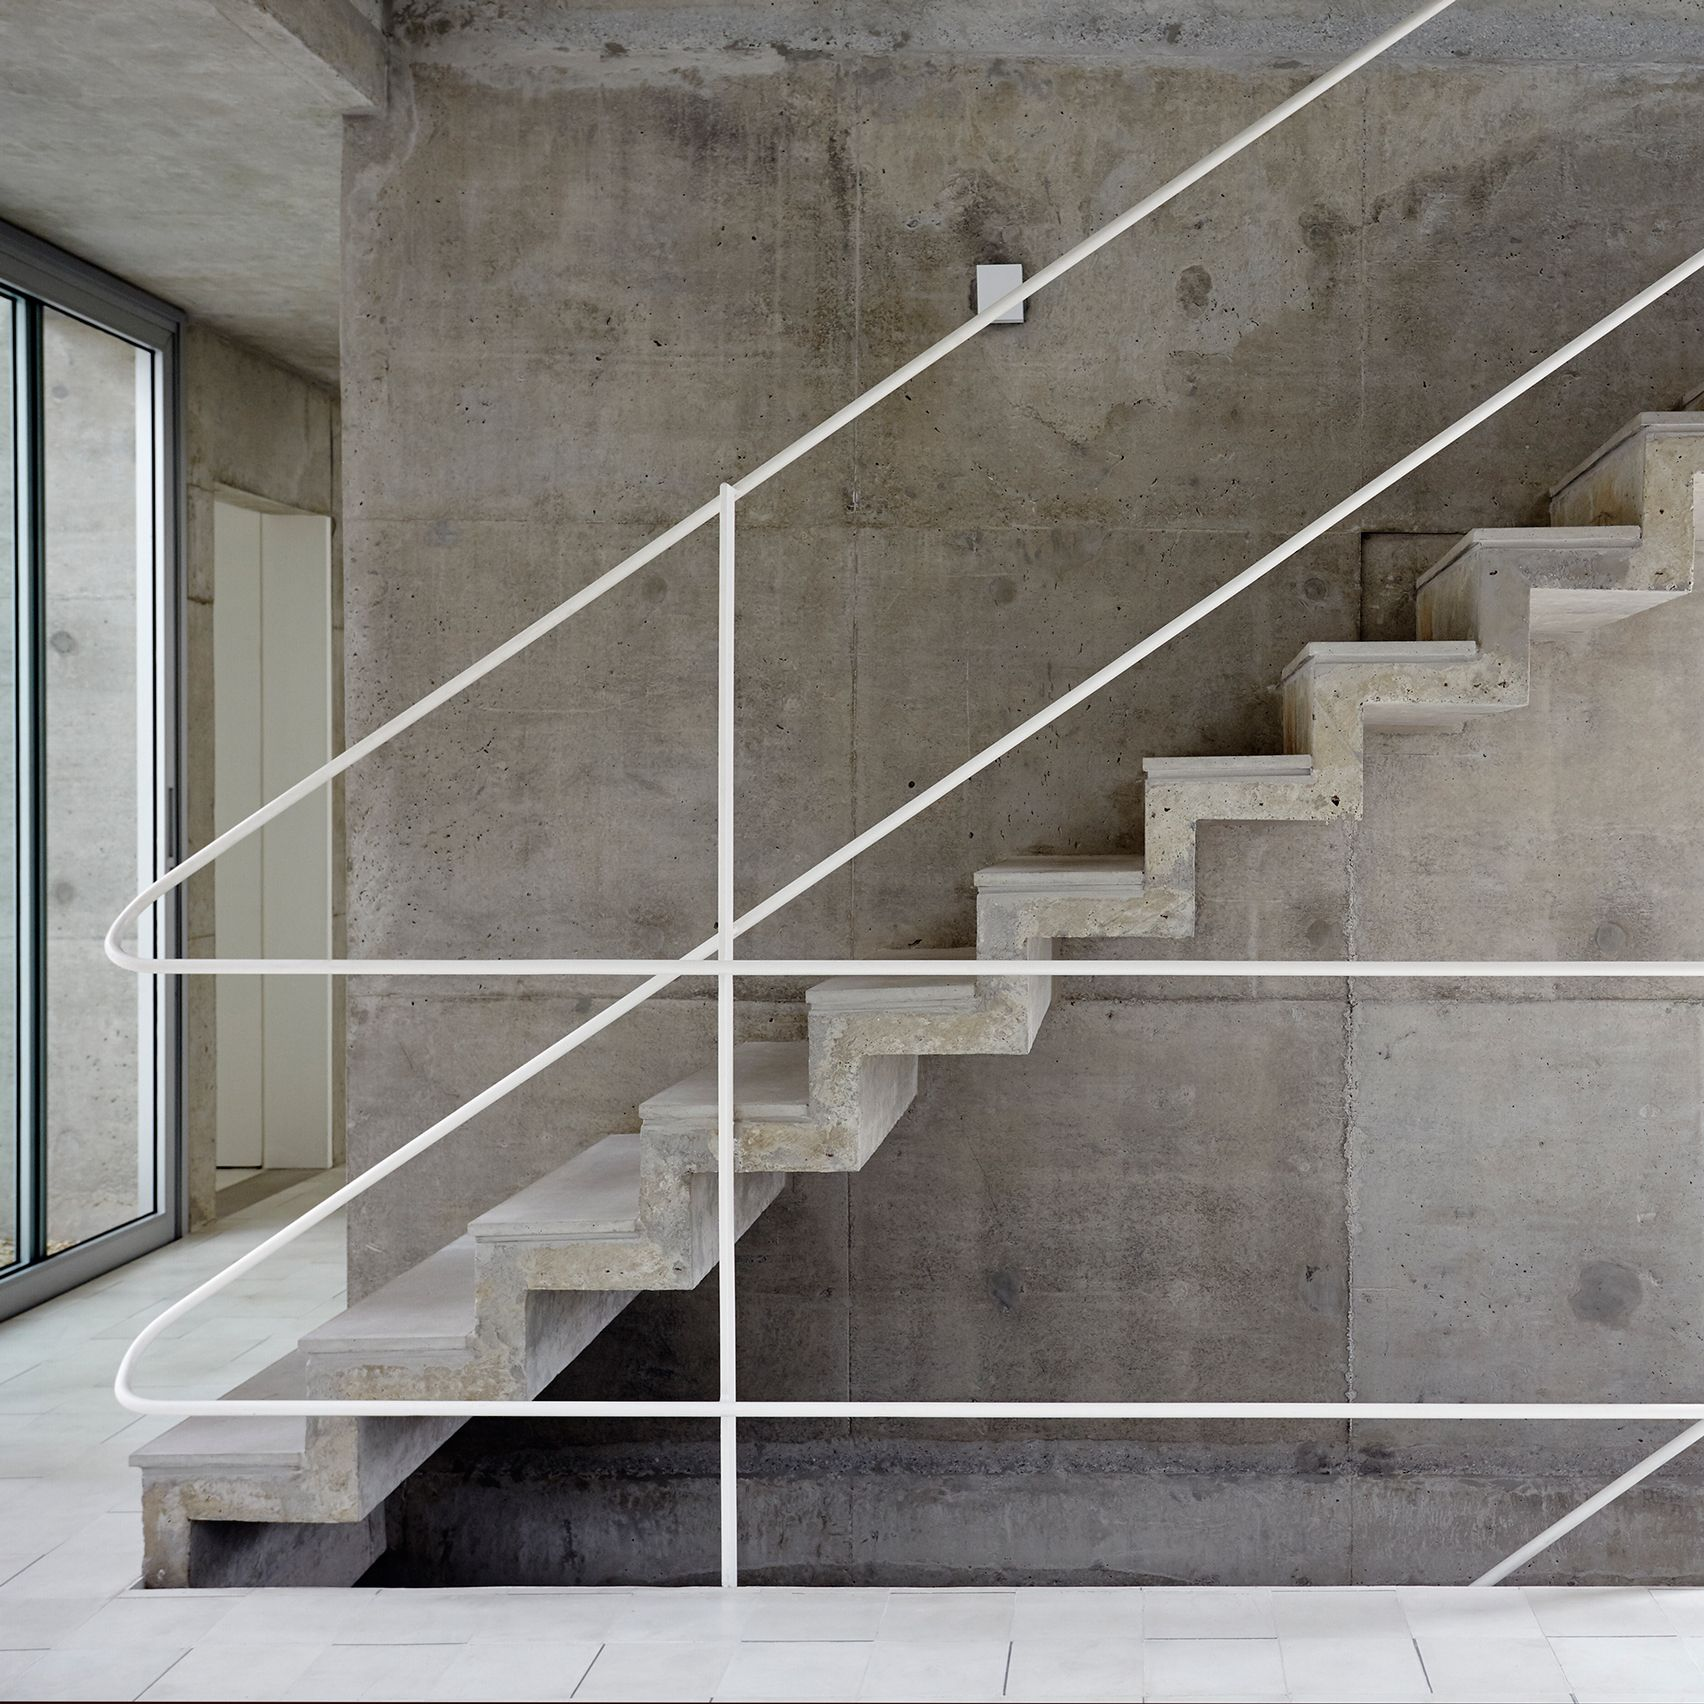 Best Bn House Metro Arquitetos Jardim Paulistano Concrete 640 x 480